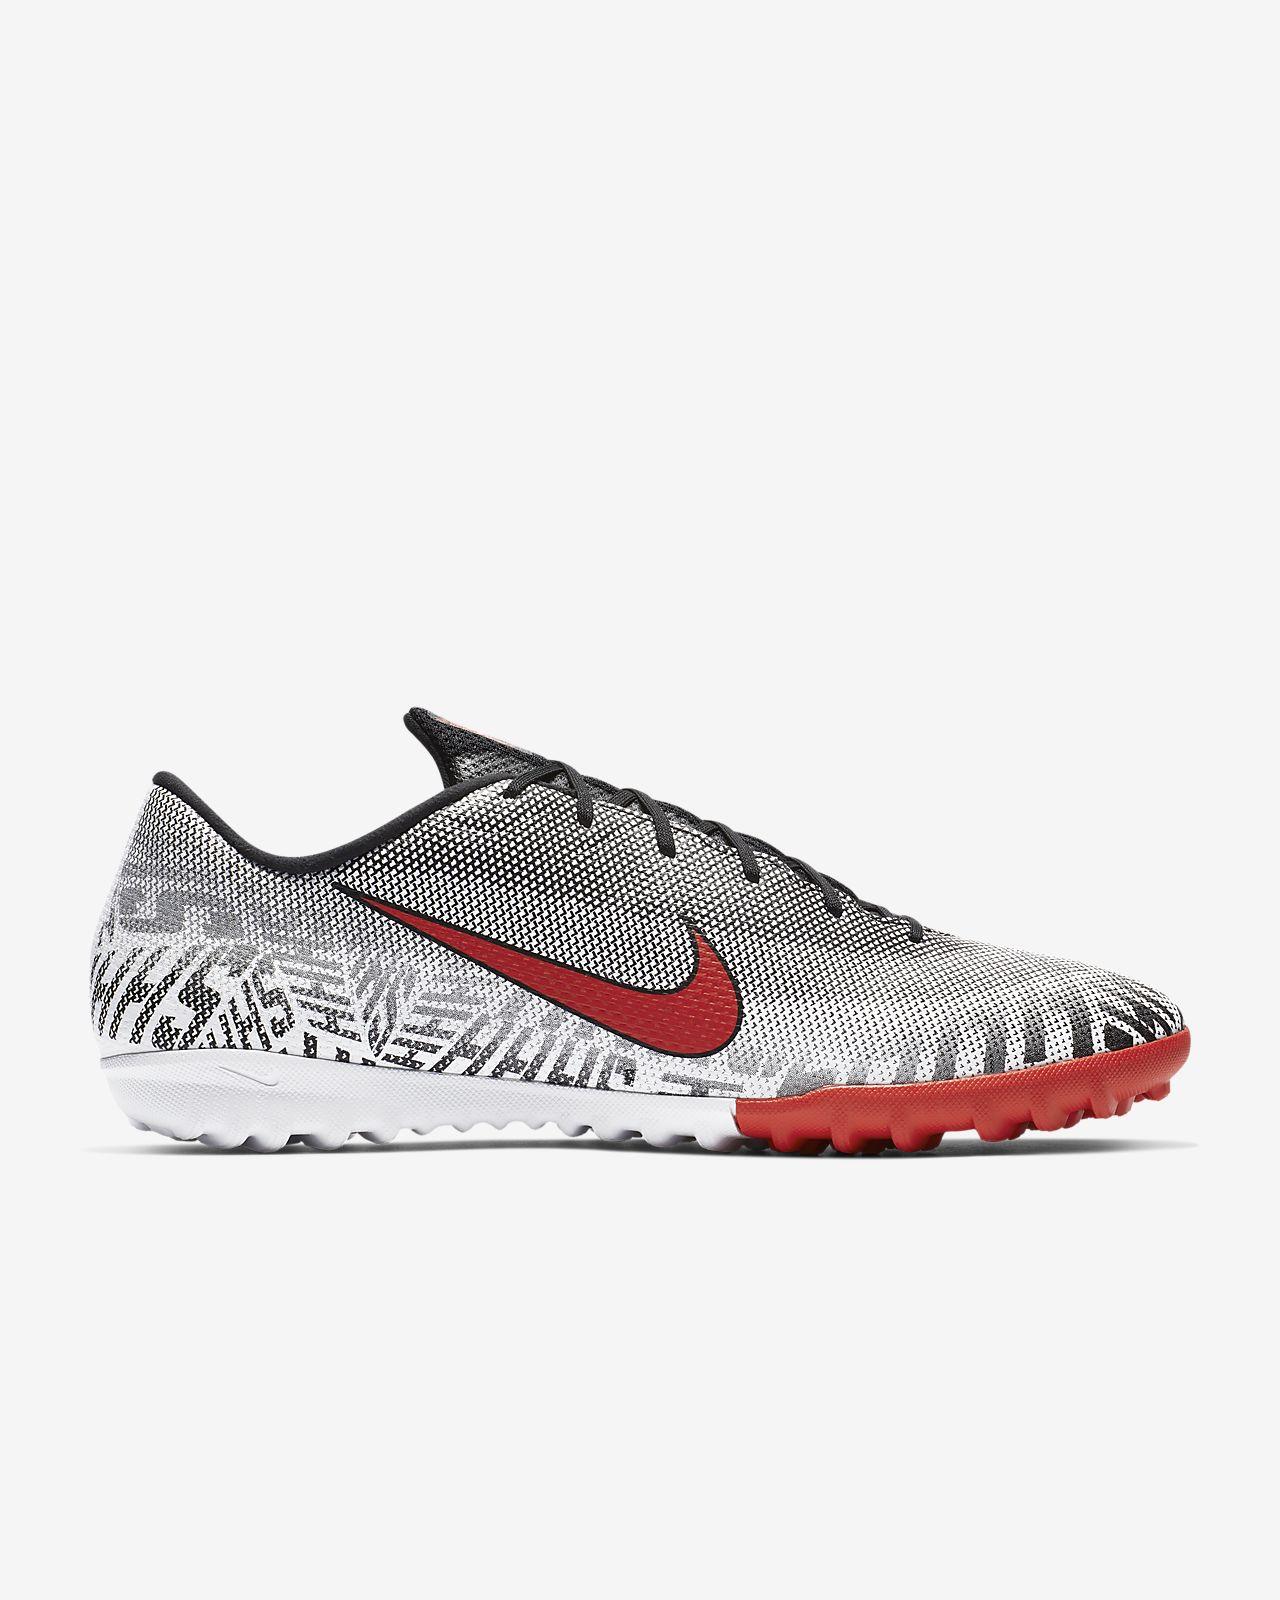 0f1de0c4aab Nike Mercurial Vapor XII Academy Neymar TF Artificial-Turf Soccer Shoe